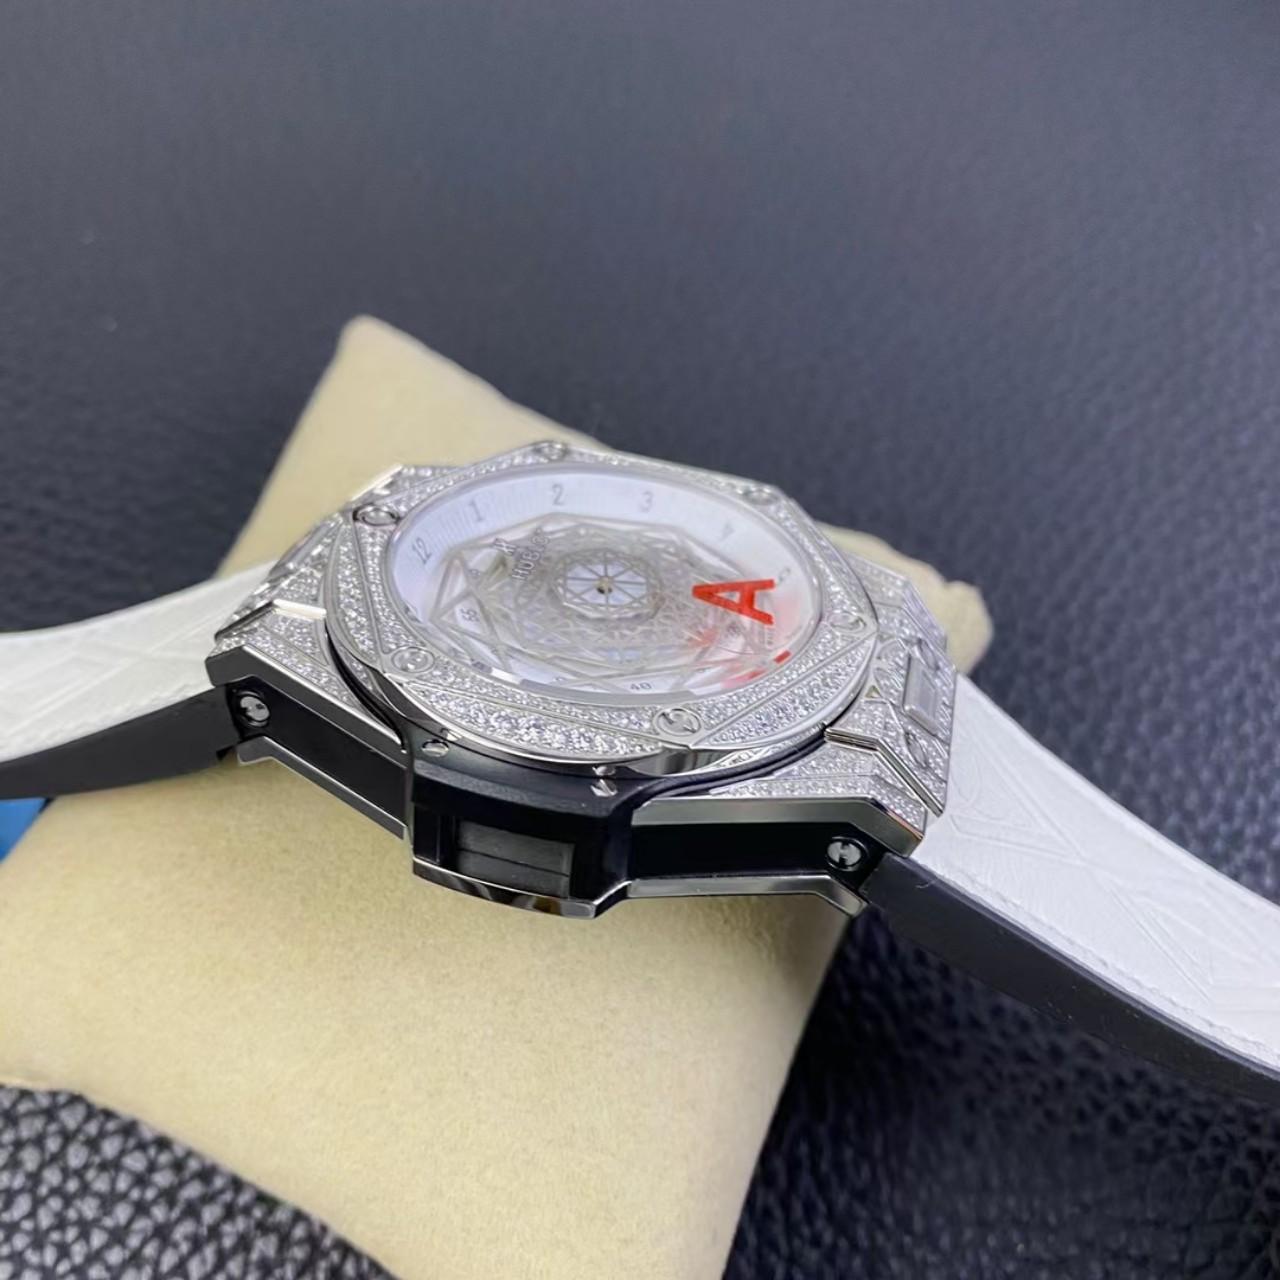 hublot-big-bang-sang-bleu-titanium-white-pave-watch-replica-1-1-cao-cap-2